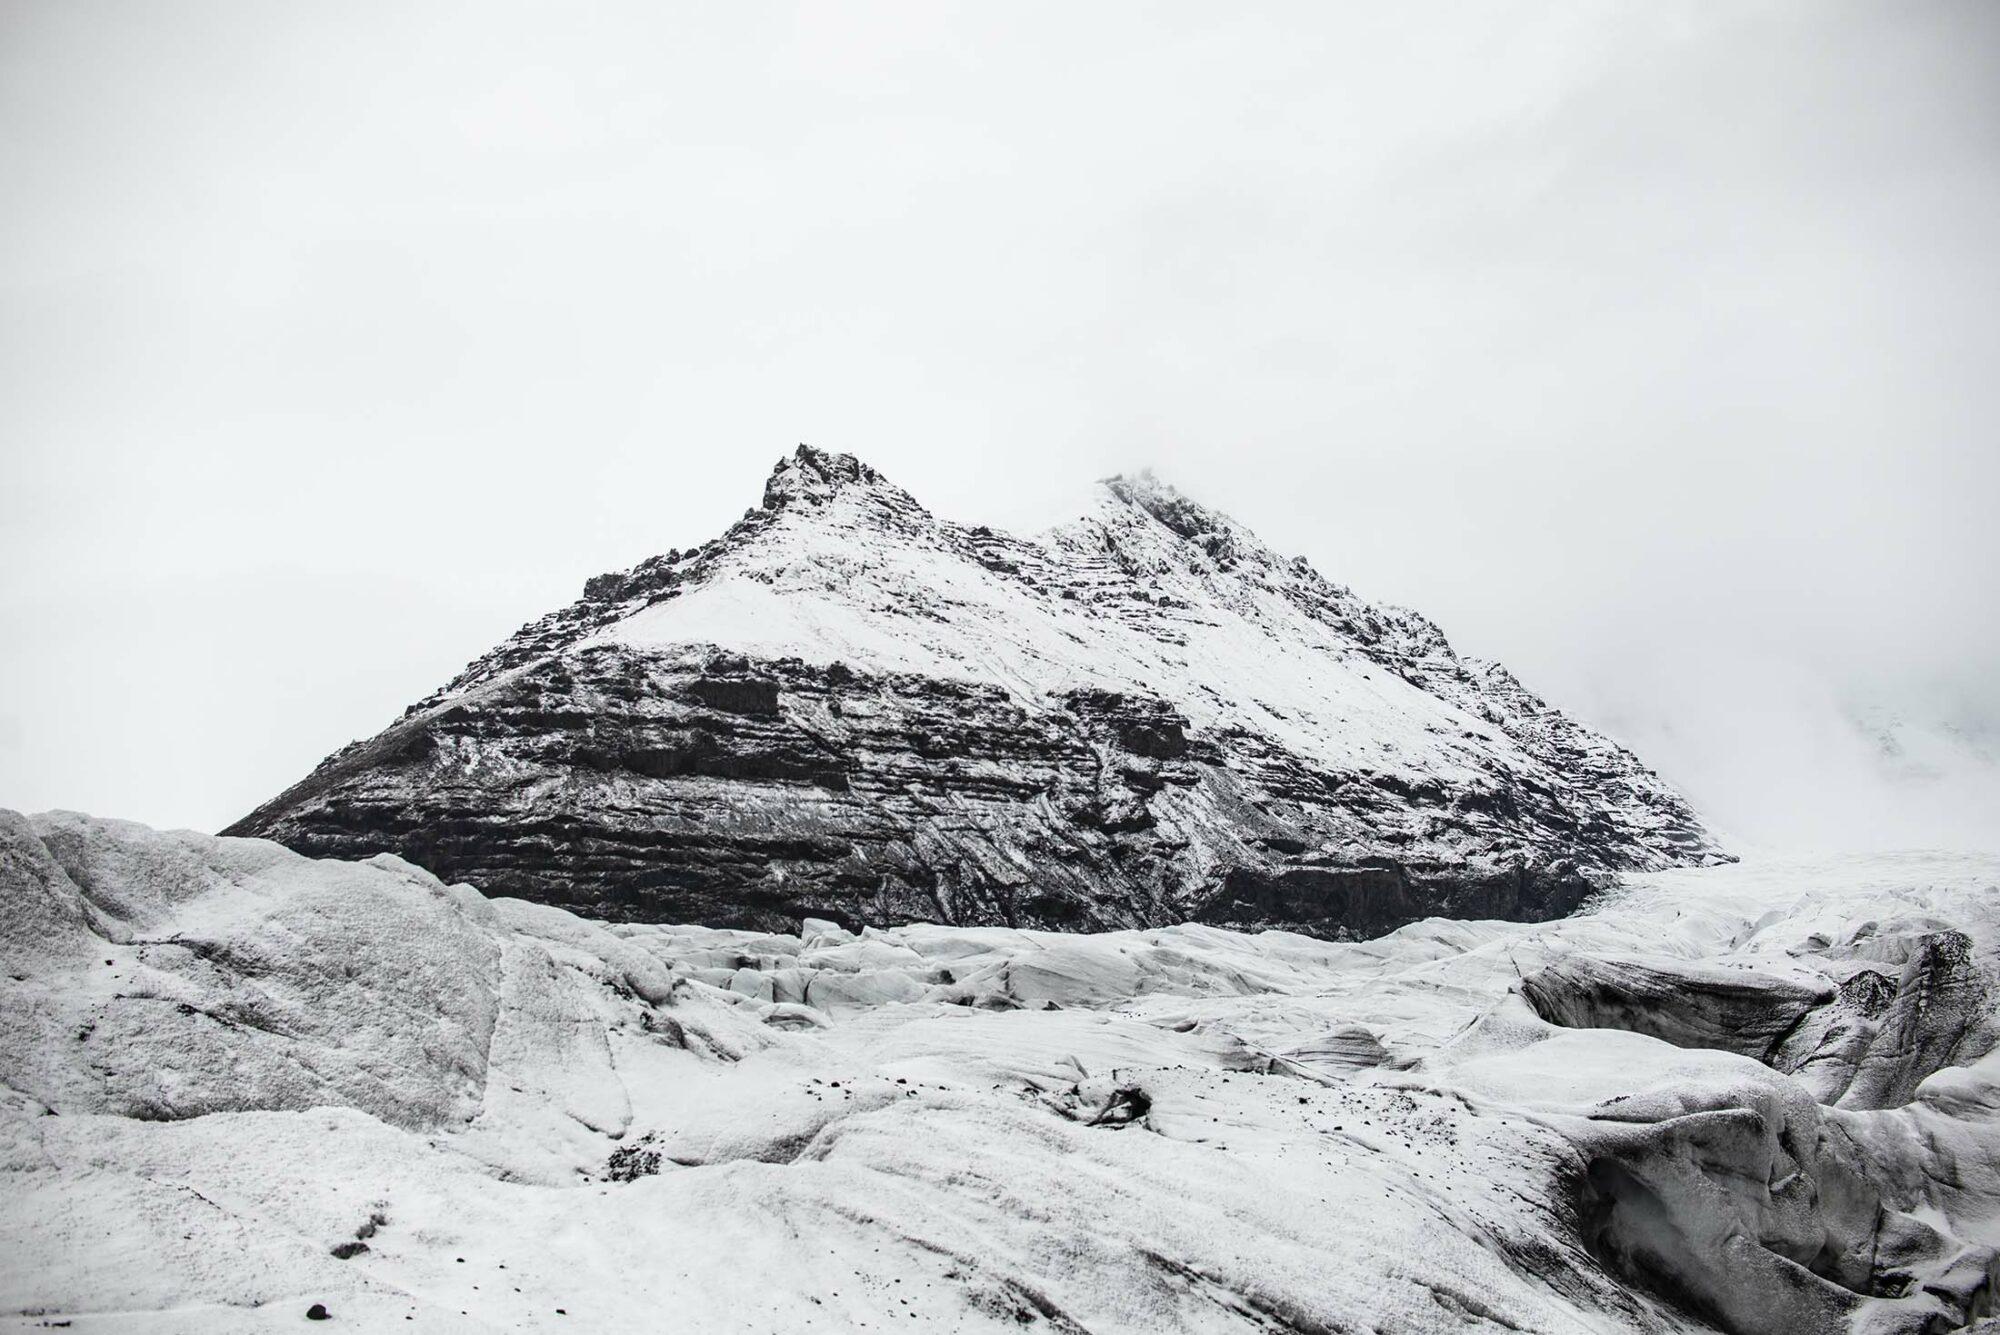 FOTOGRAFIETIP LANDSCHAPPEN FOTOGRAFEREN | GROOTSE FOTO'S IN IJSLAND 1